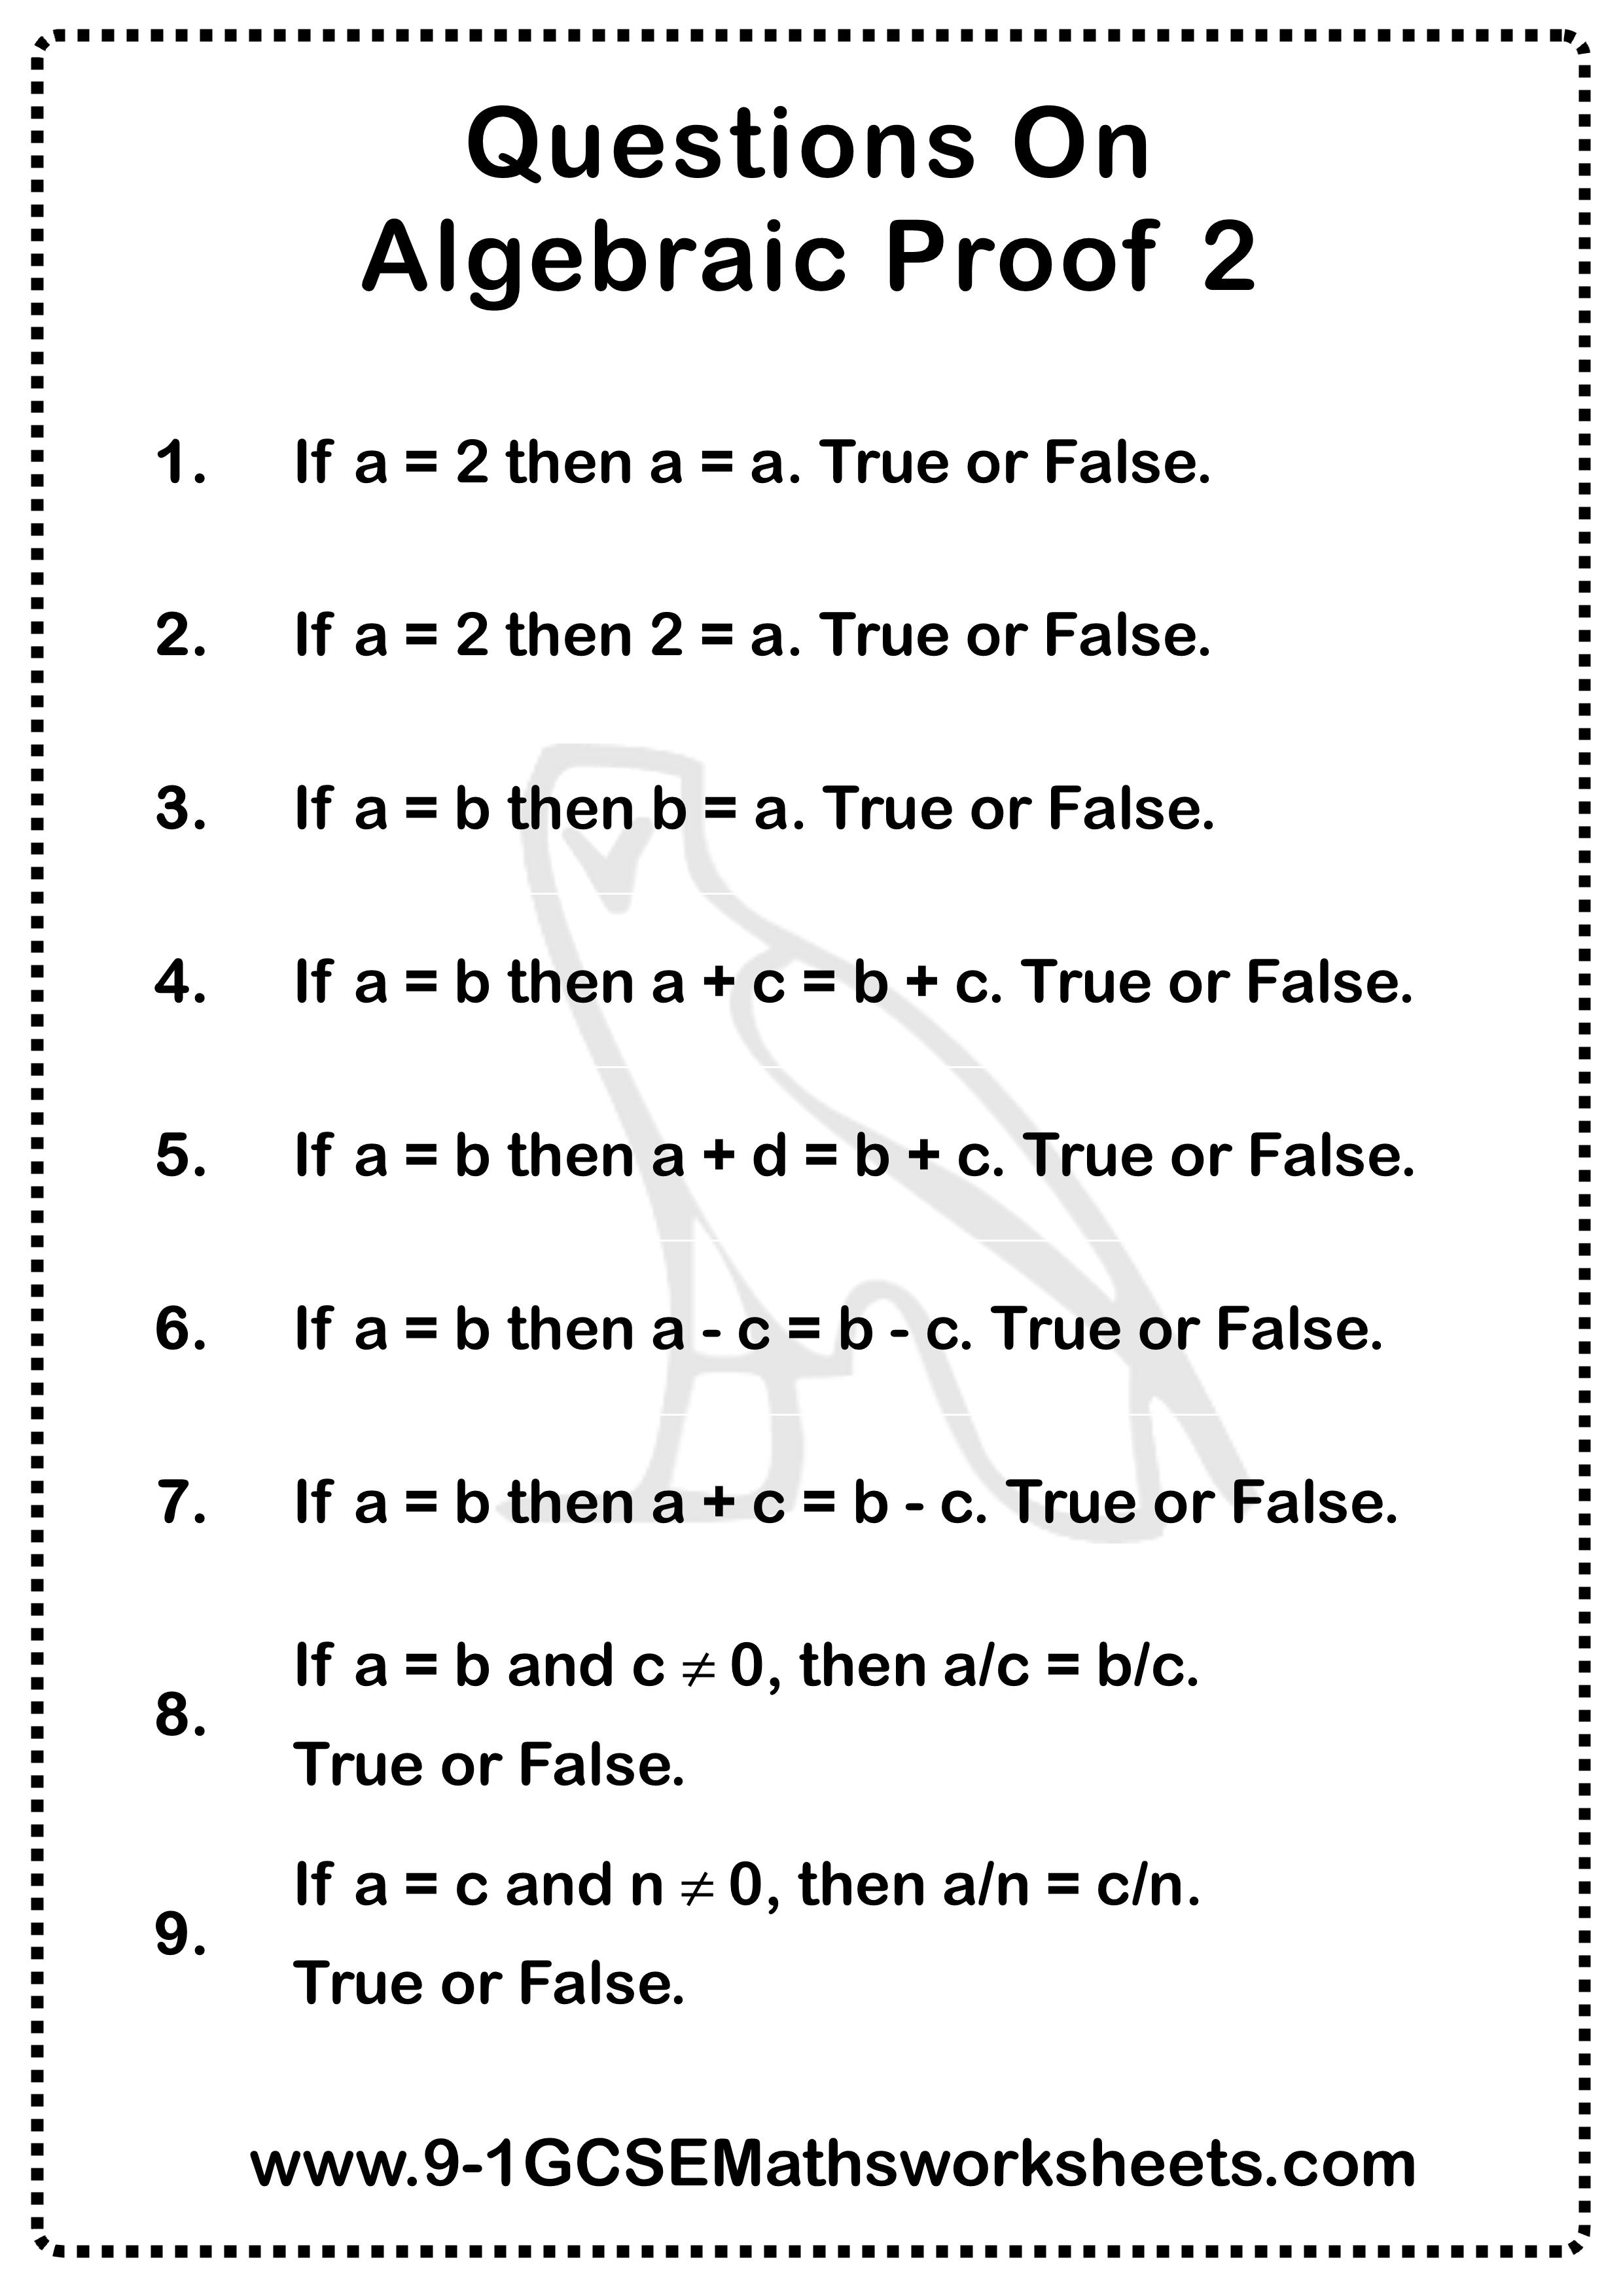 medium resolution of Algebraic Proof Questions 2   Algebraic proof